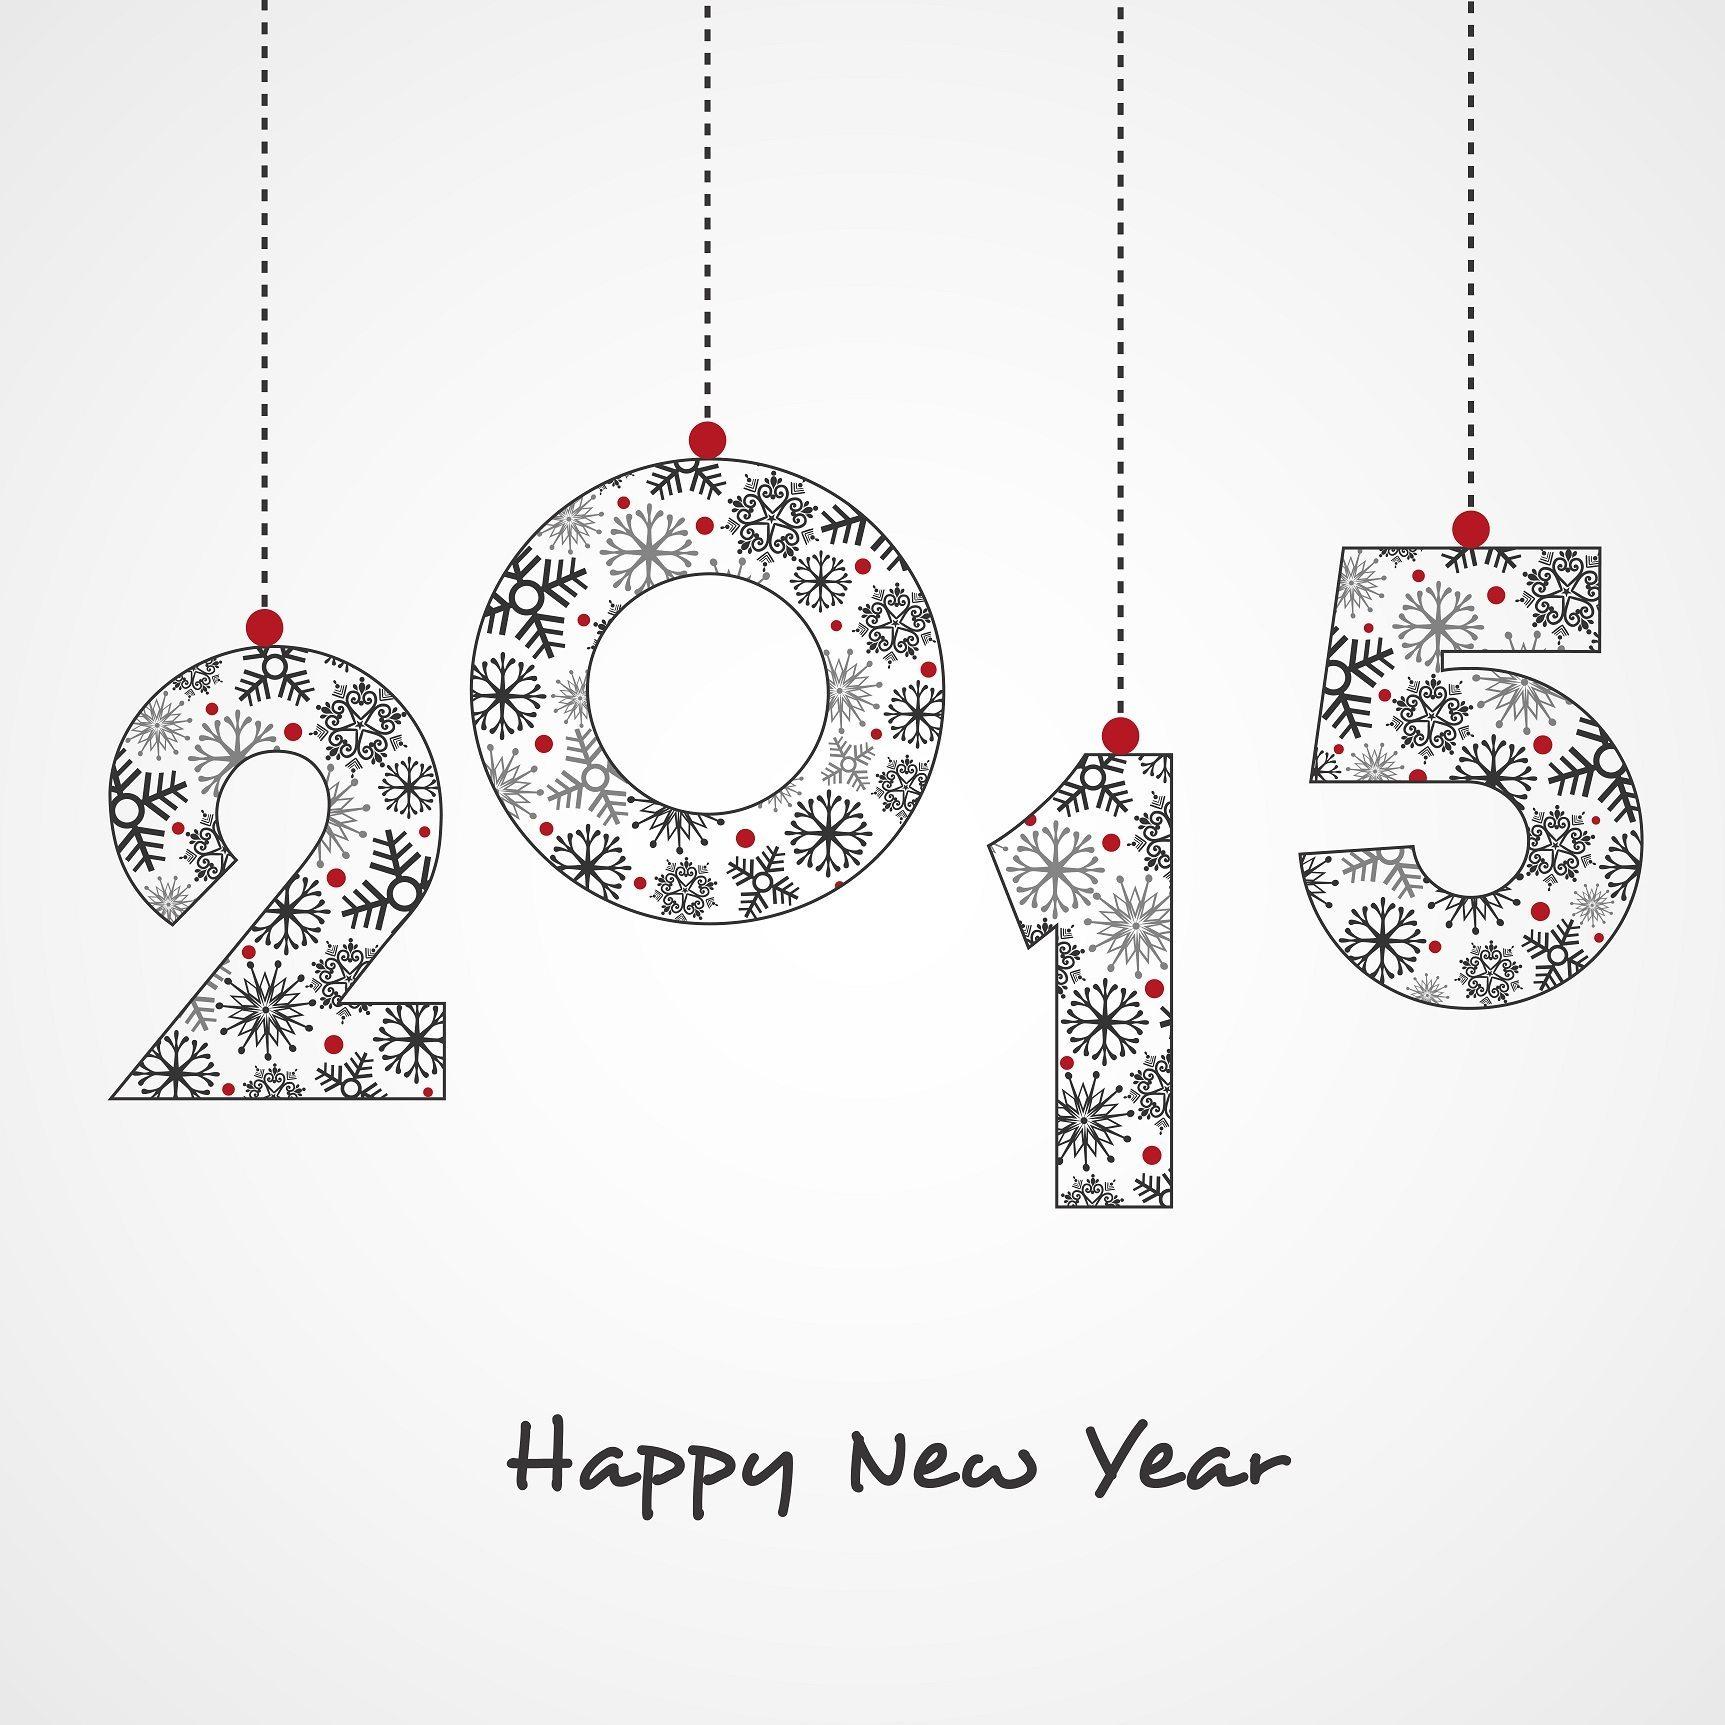 ICYMI: New Year, New Perspective – Millennials & Print